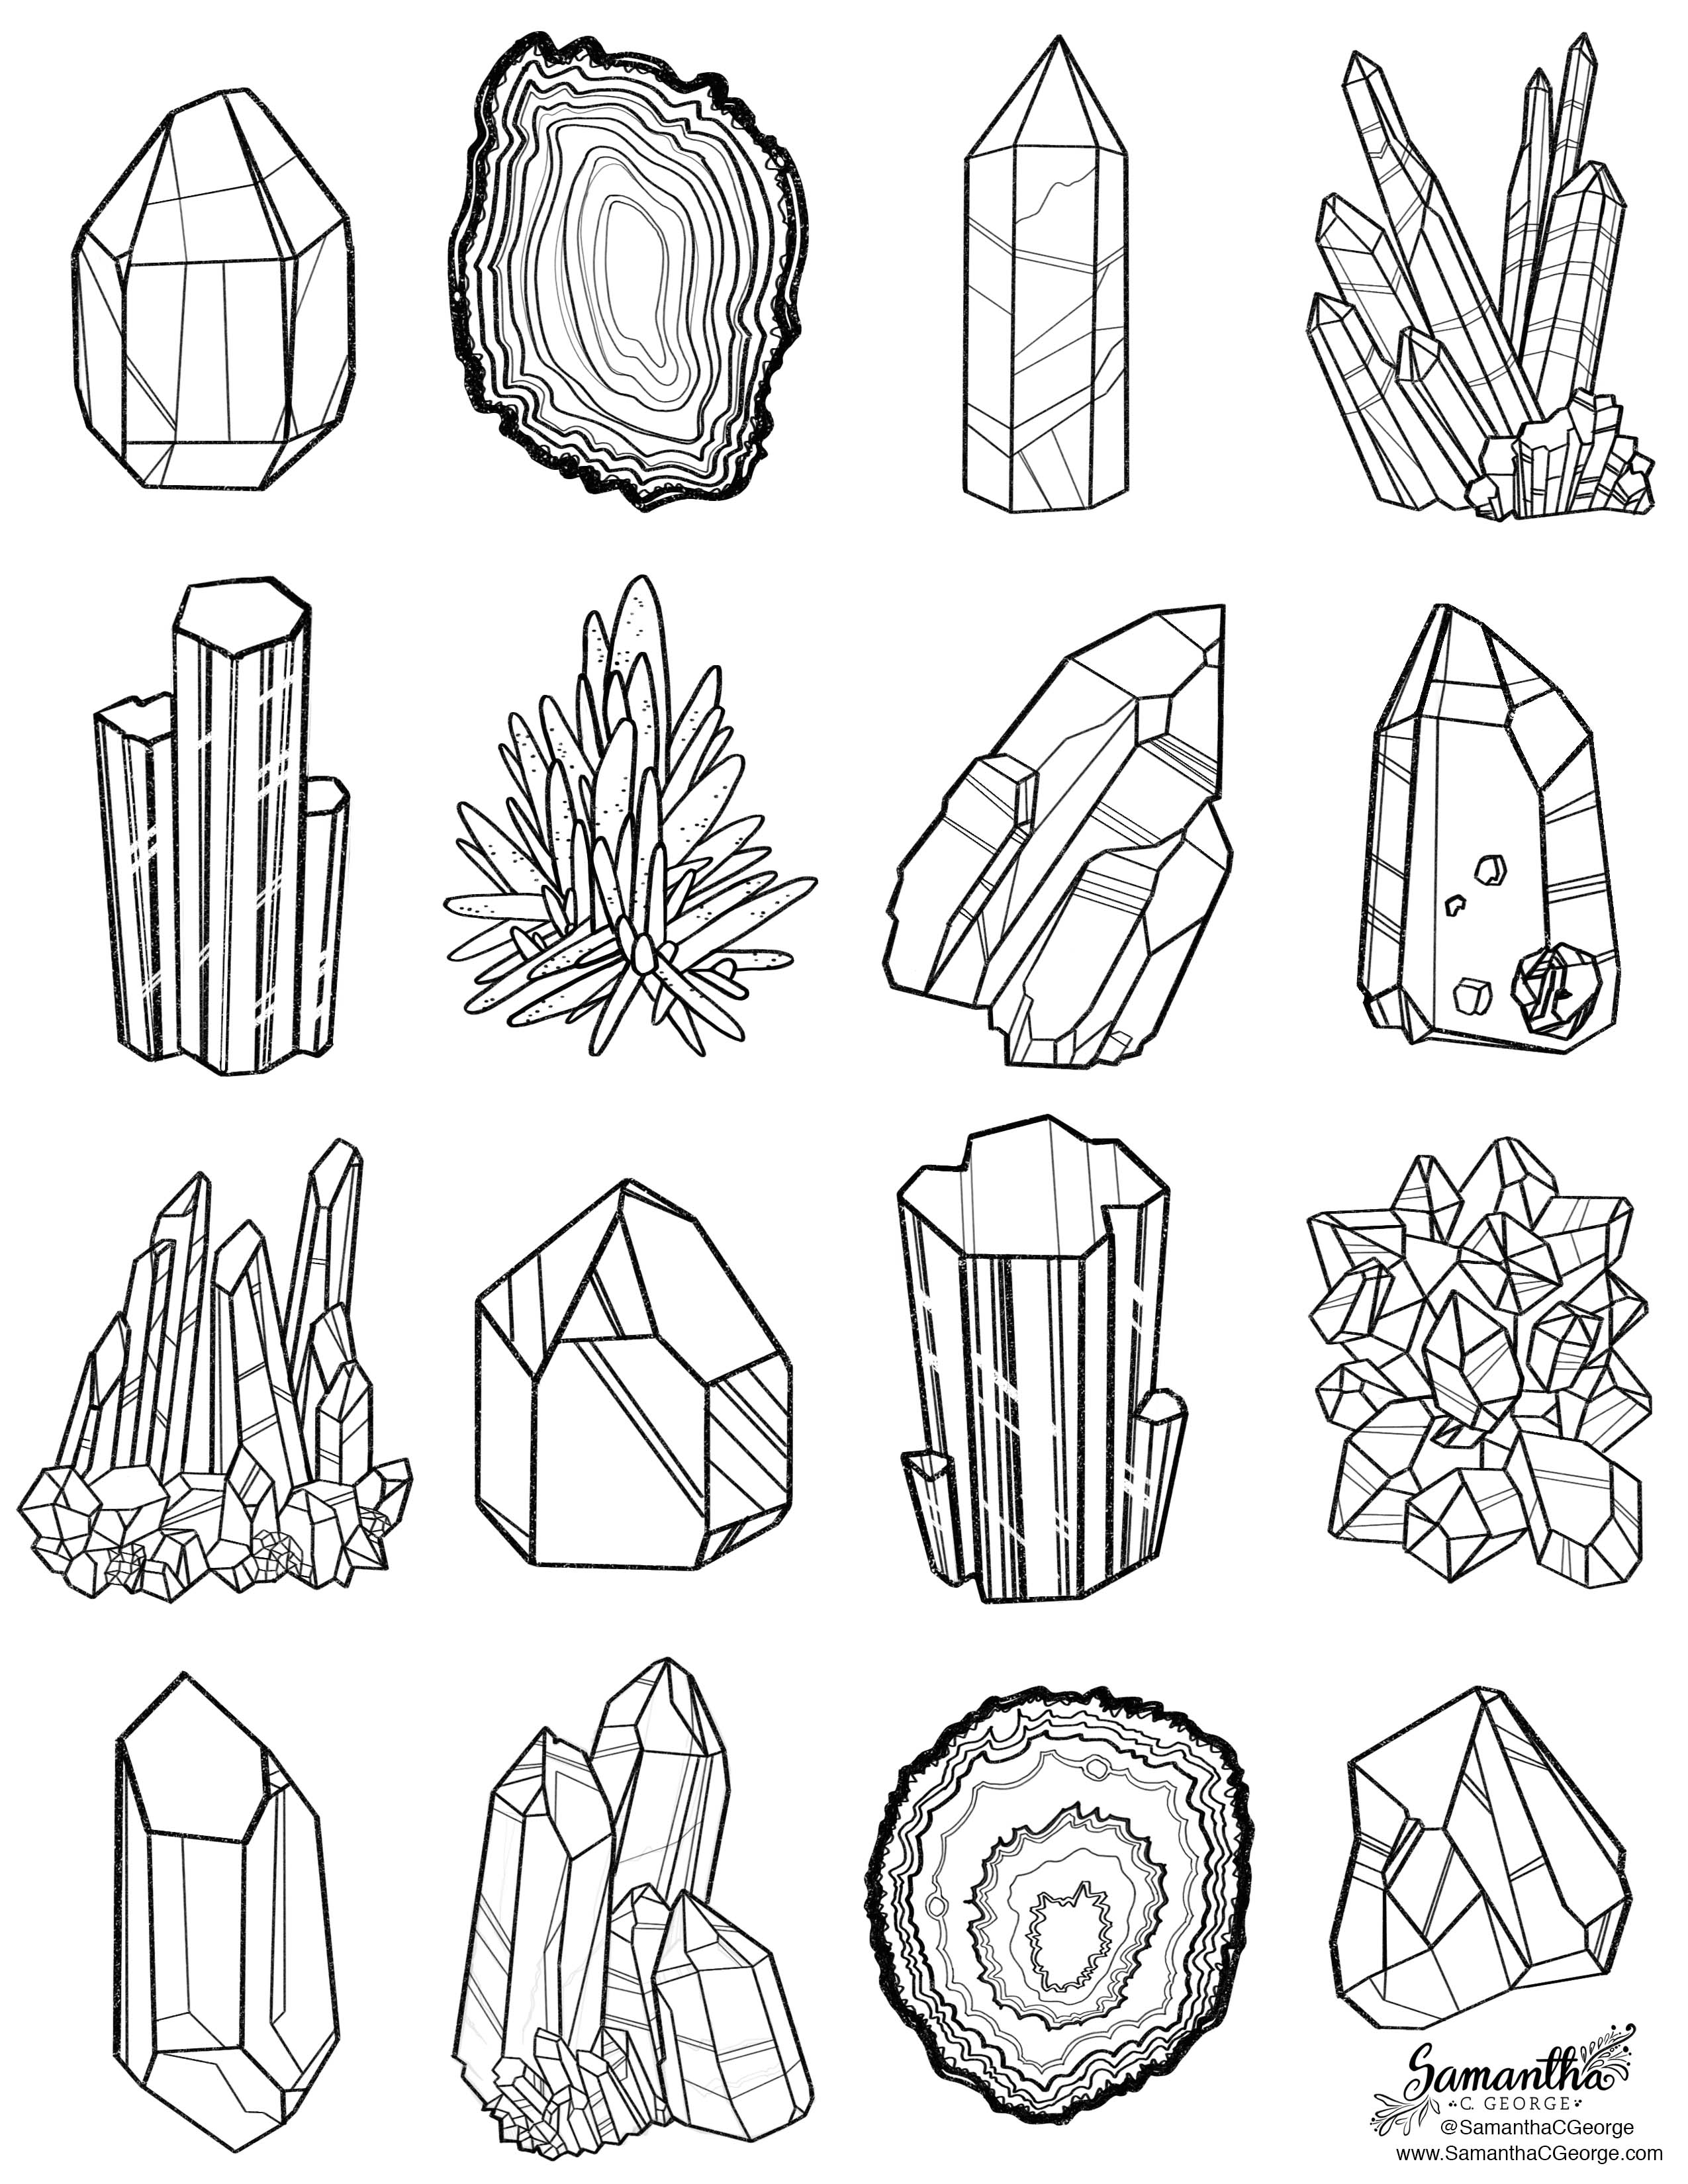 Drawn rock coloring Printables coloring Printable Tattoo page